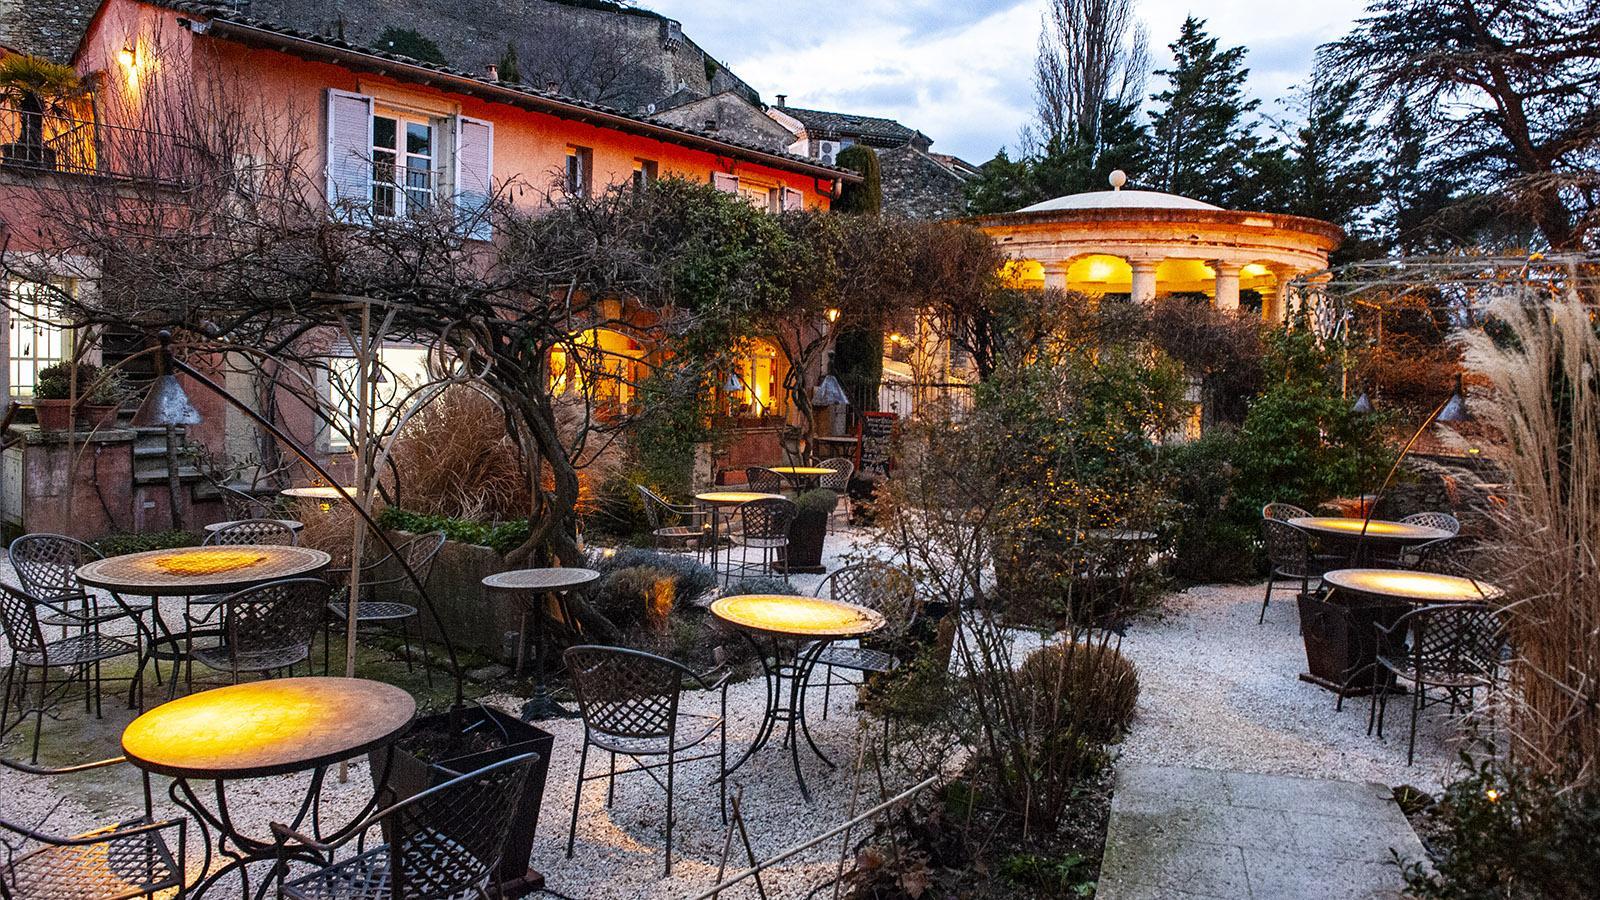 Grignan: Hôtel Clair de Plume. Foto: Hilke Maunder